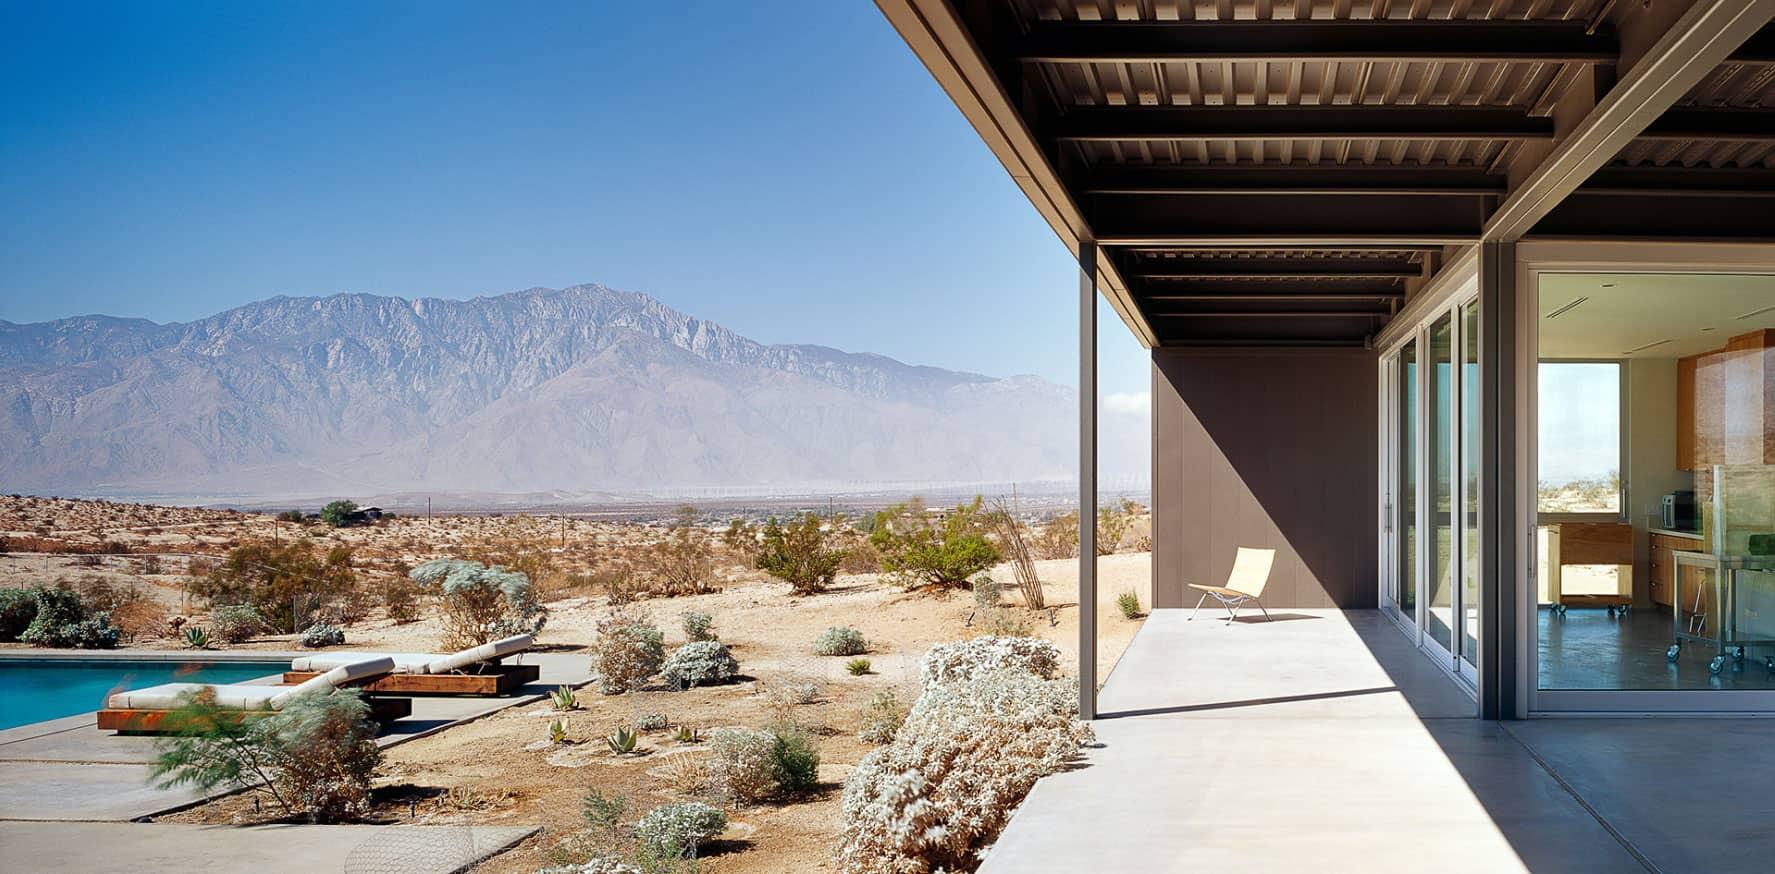 Contemporary House in Desert Hot Springs by Marmol Radziner   HomeDSGN